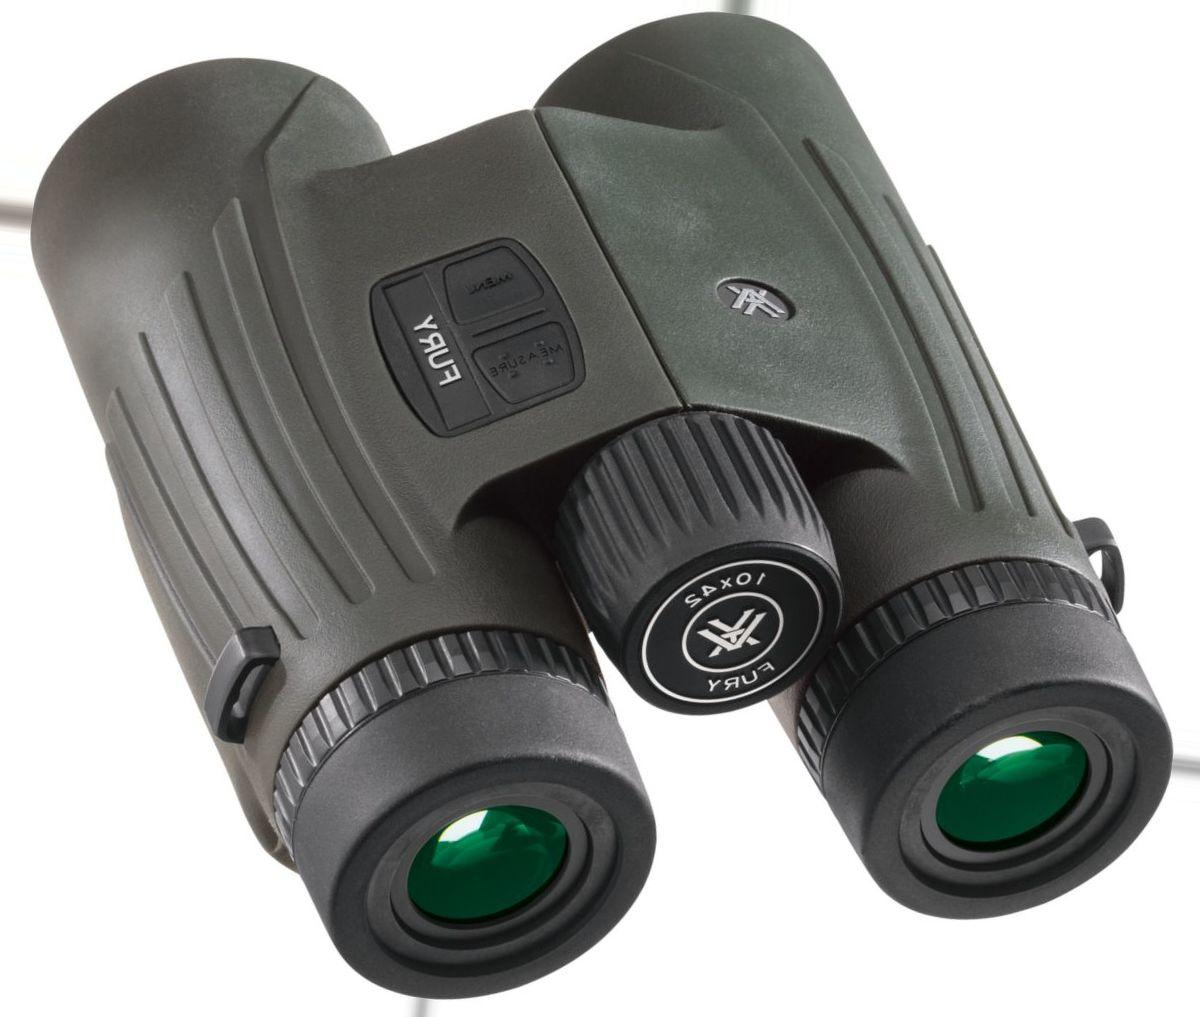 Vortex® Fury HD 10x42 Rangefinding Binoculars